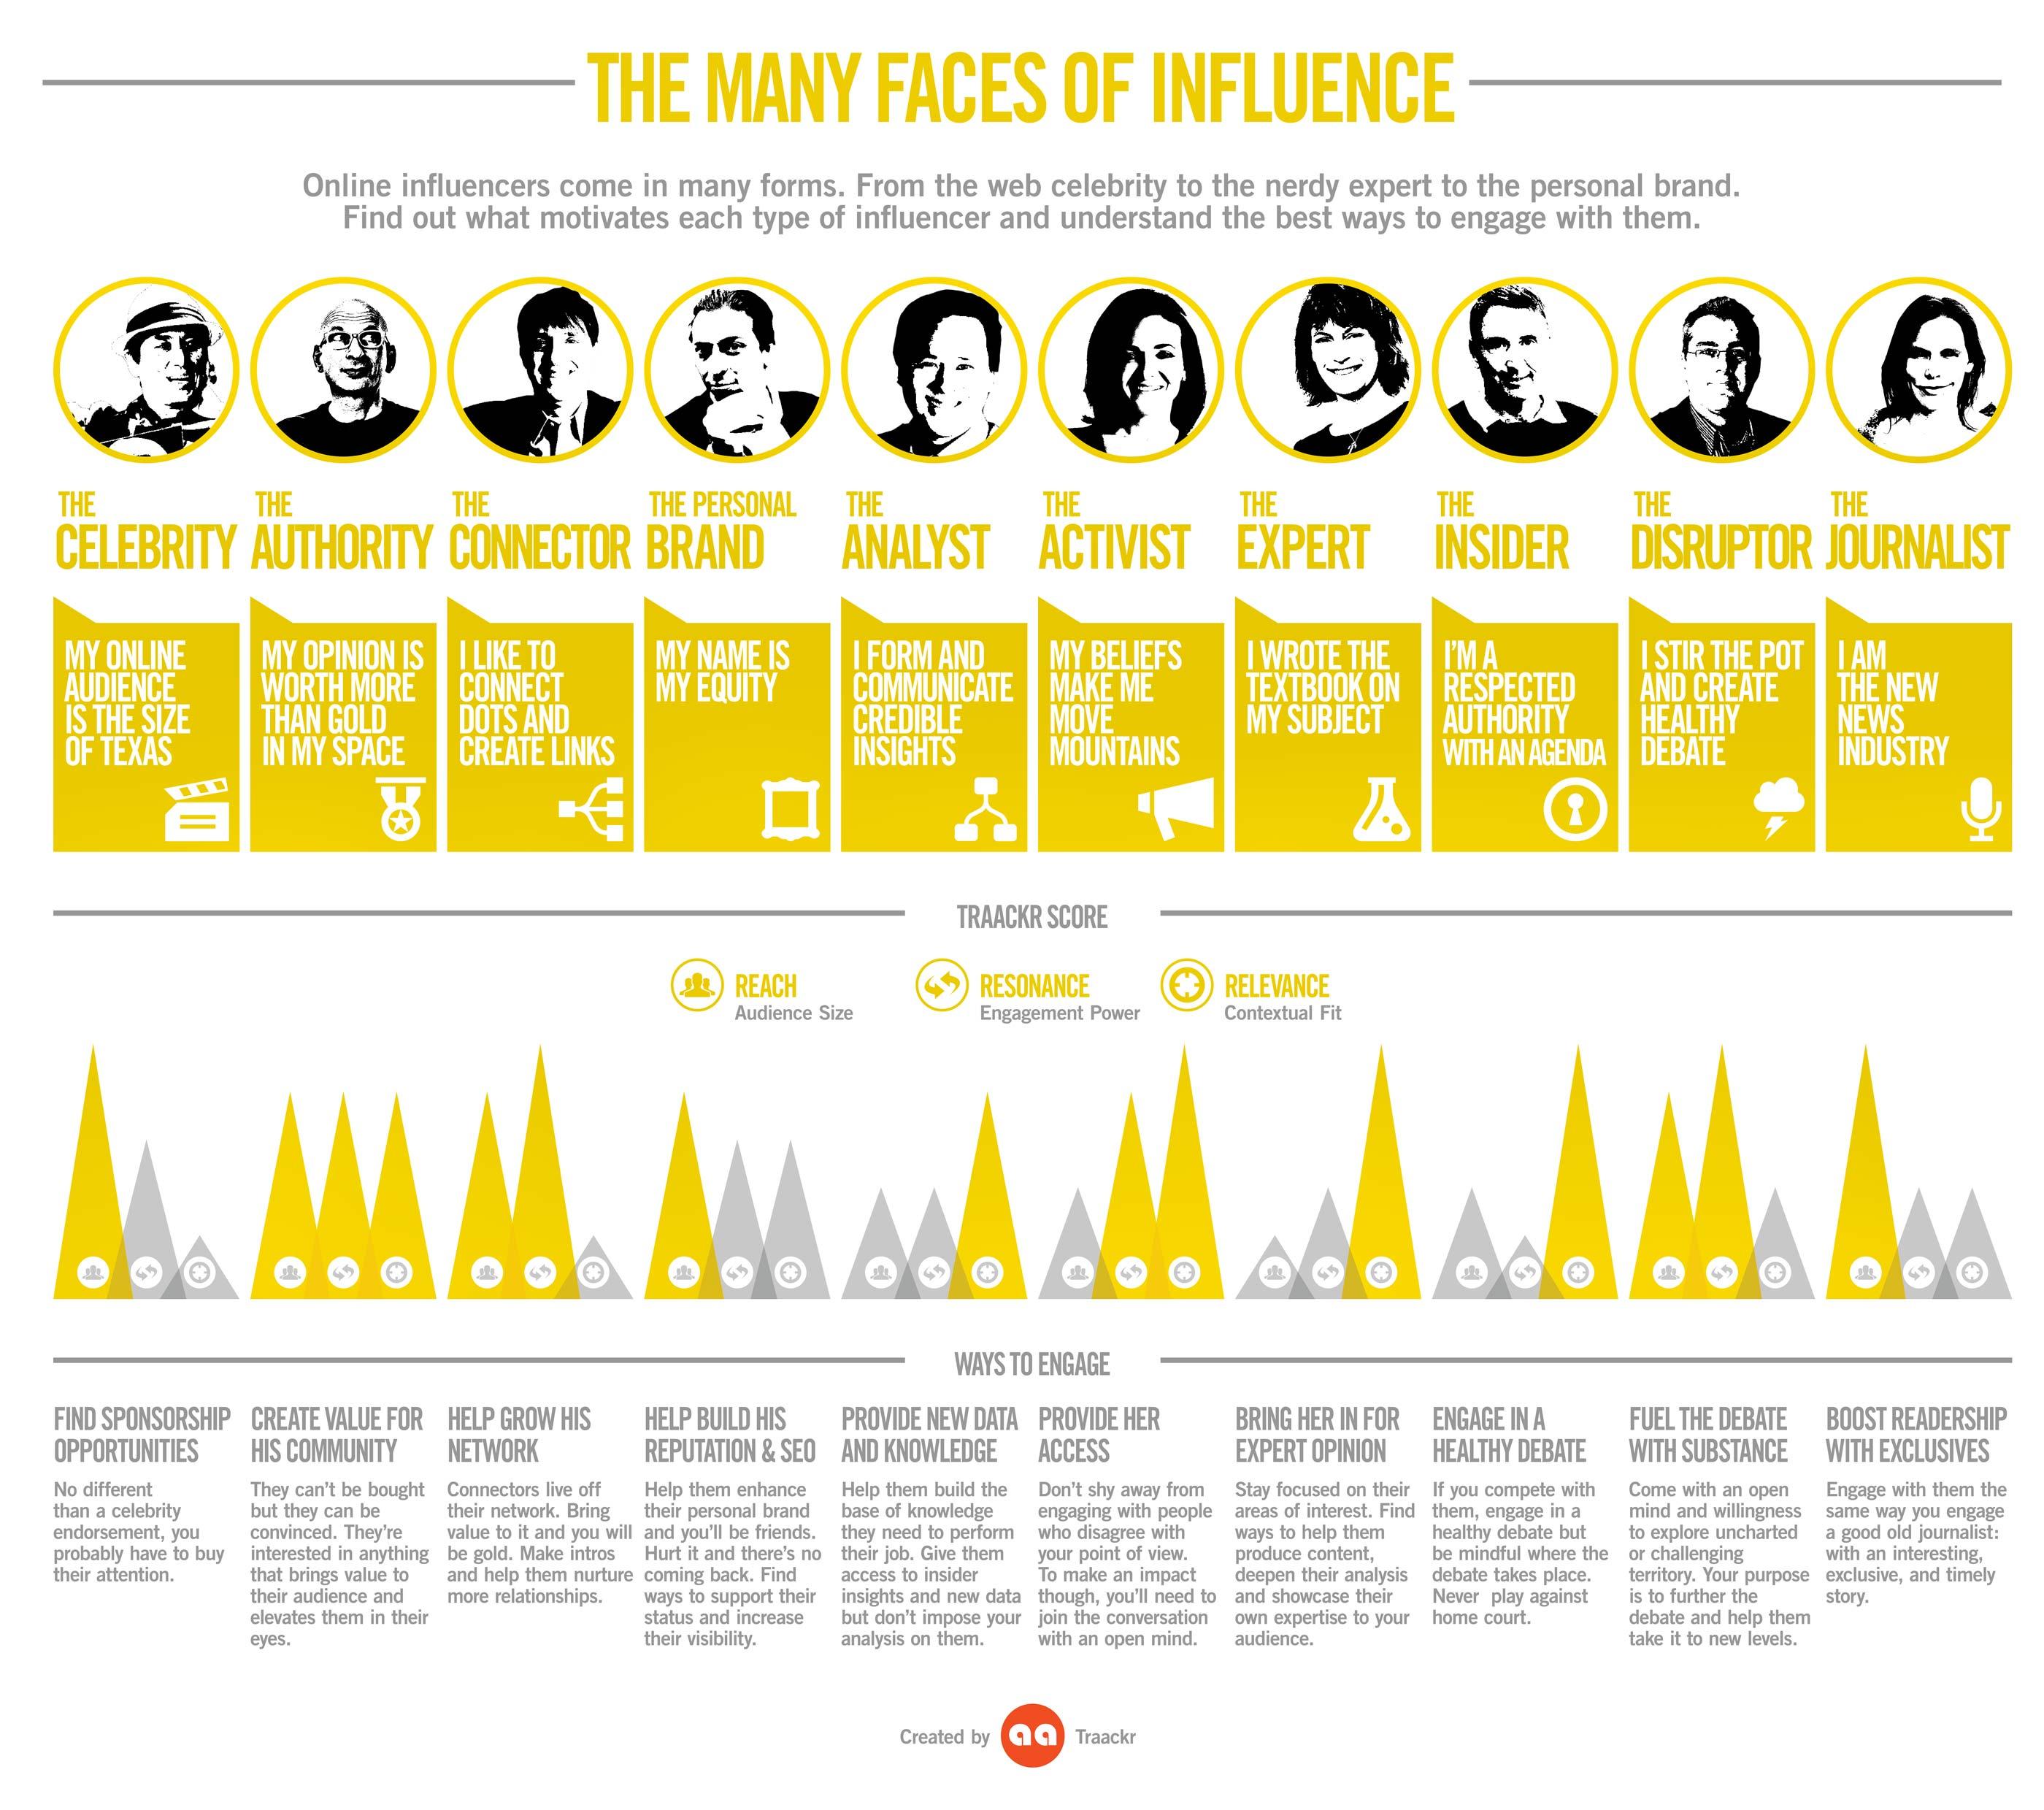 An Infographic of Les Visages de l'Influence: 10 key influencer archetypes